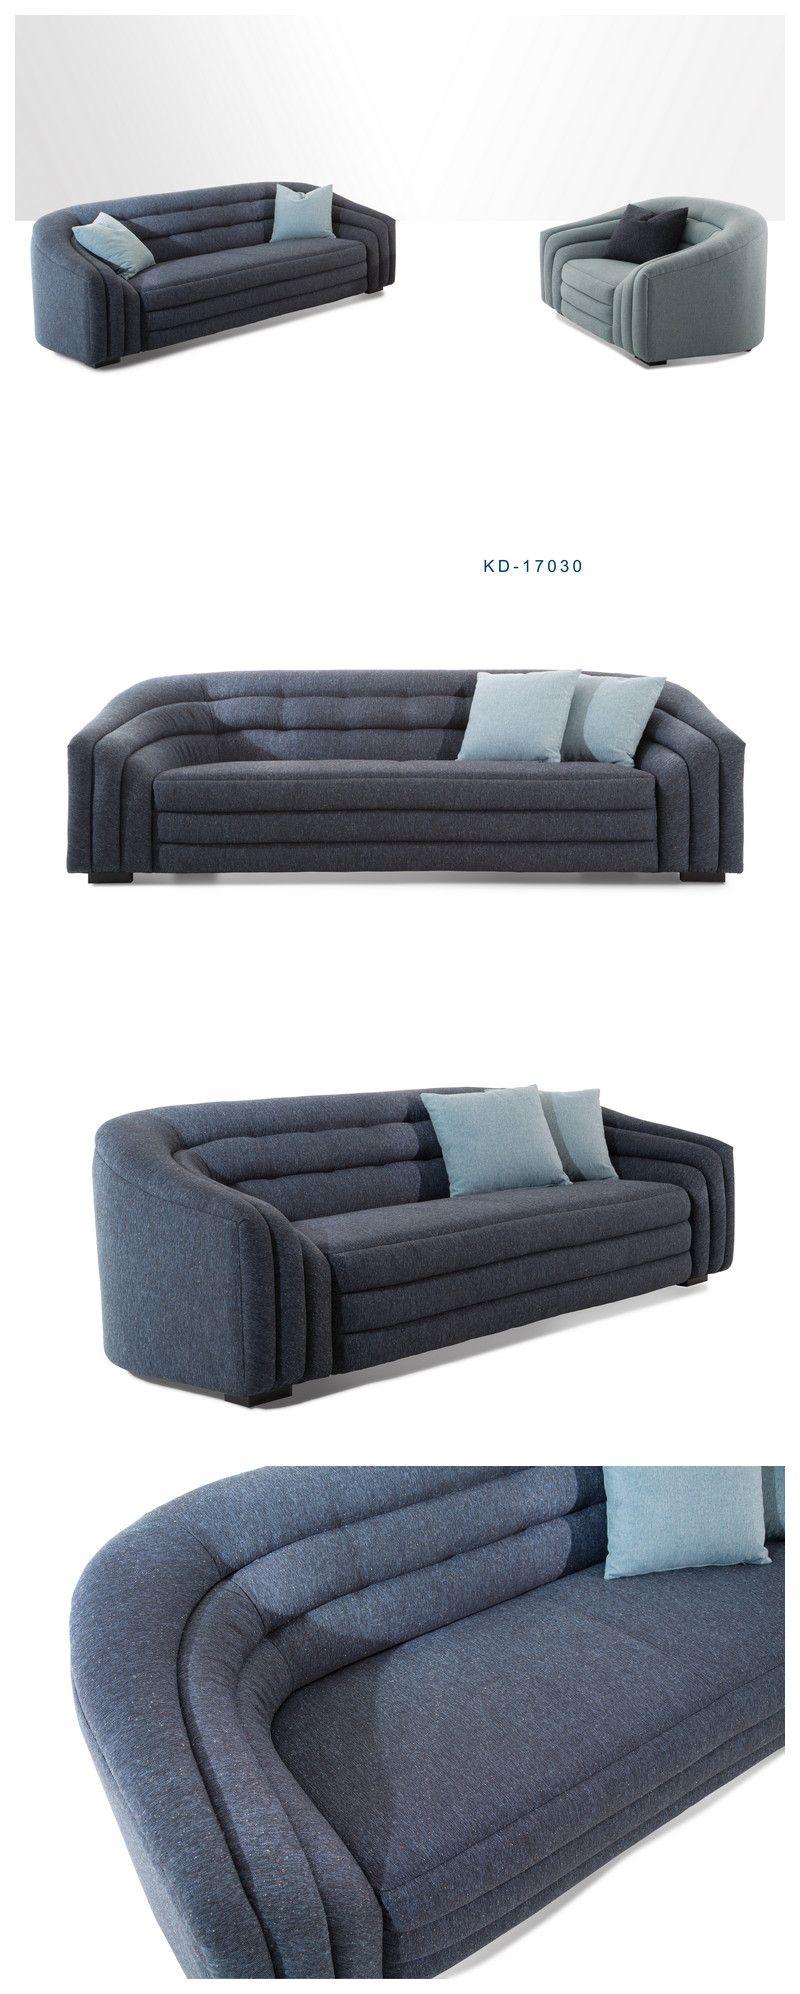 New Model Furniture Living Room Modern Wooden Sofa Design New